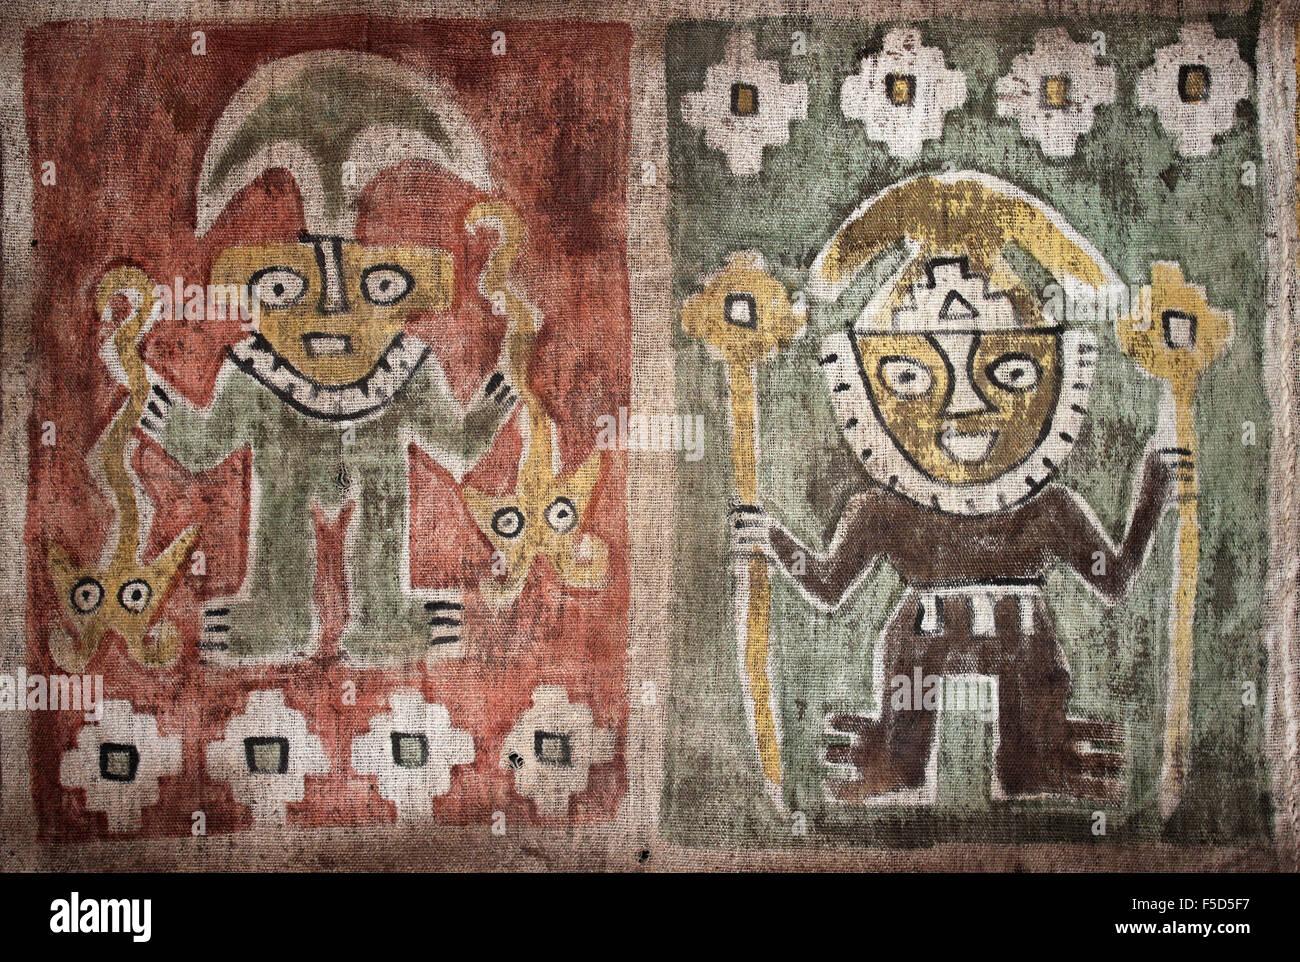 viracocha and son inti deities of pre